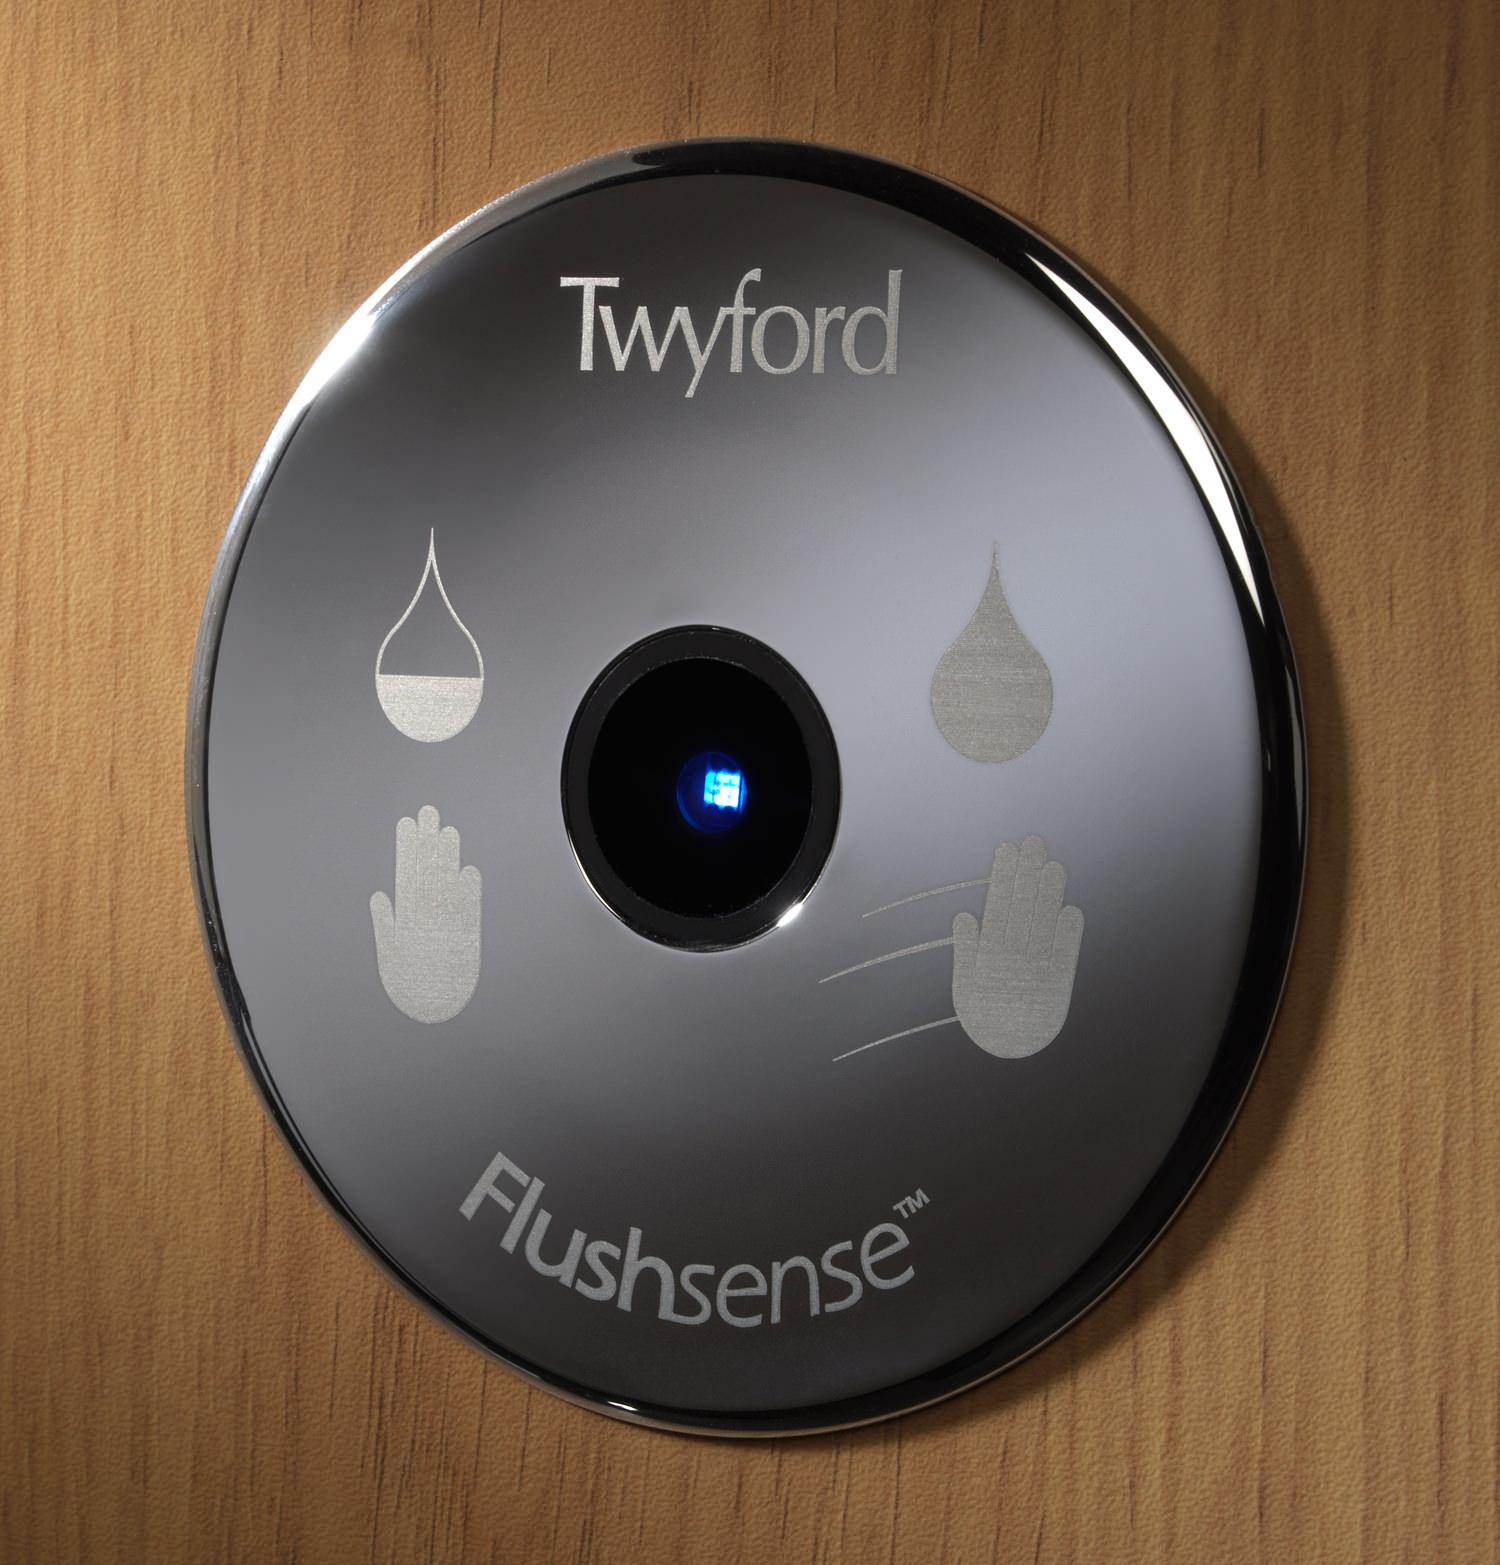 Twyford Dual Flush Flushsense Infra Red Sensor Cf9301cp